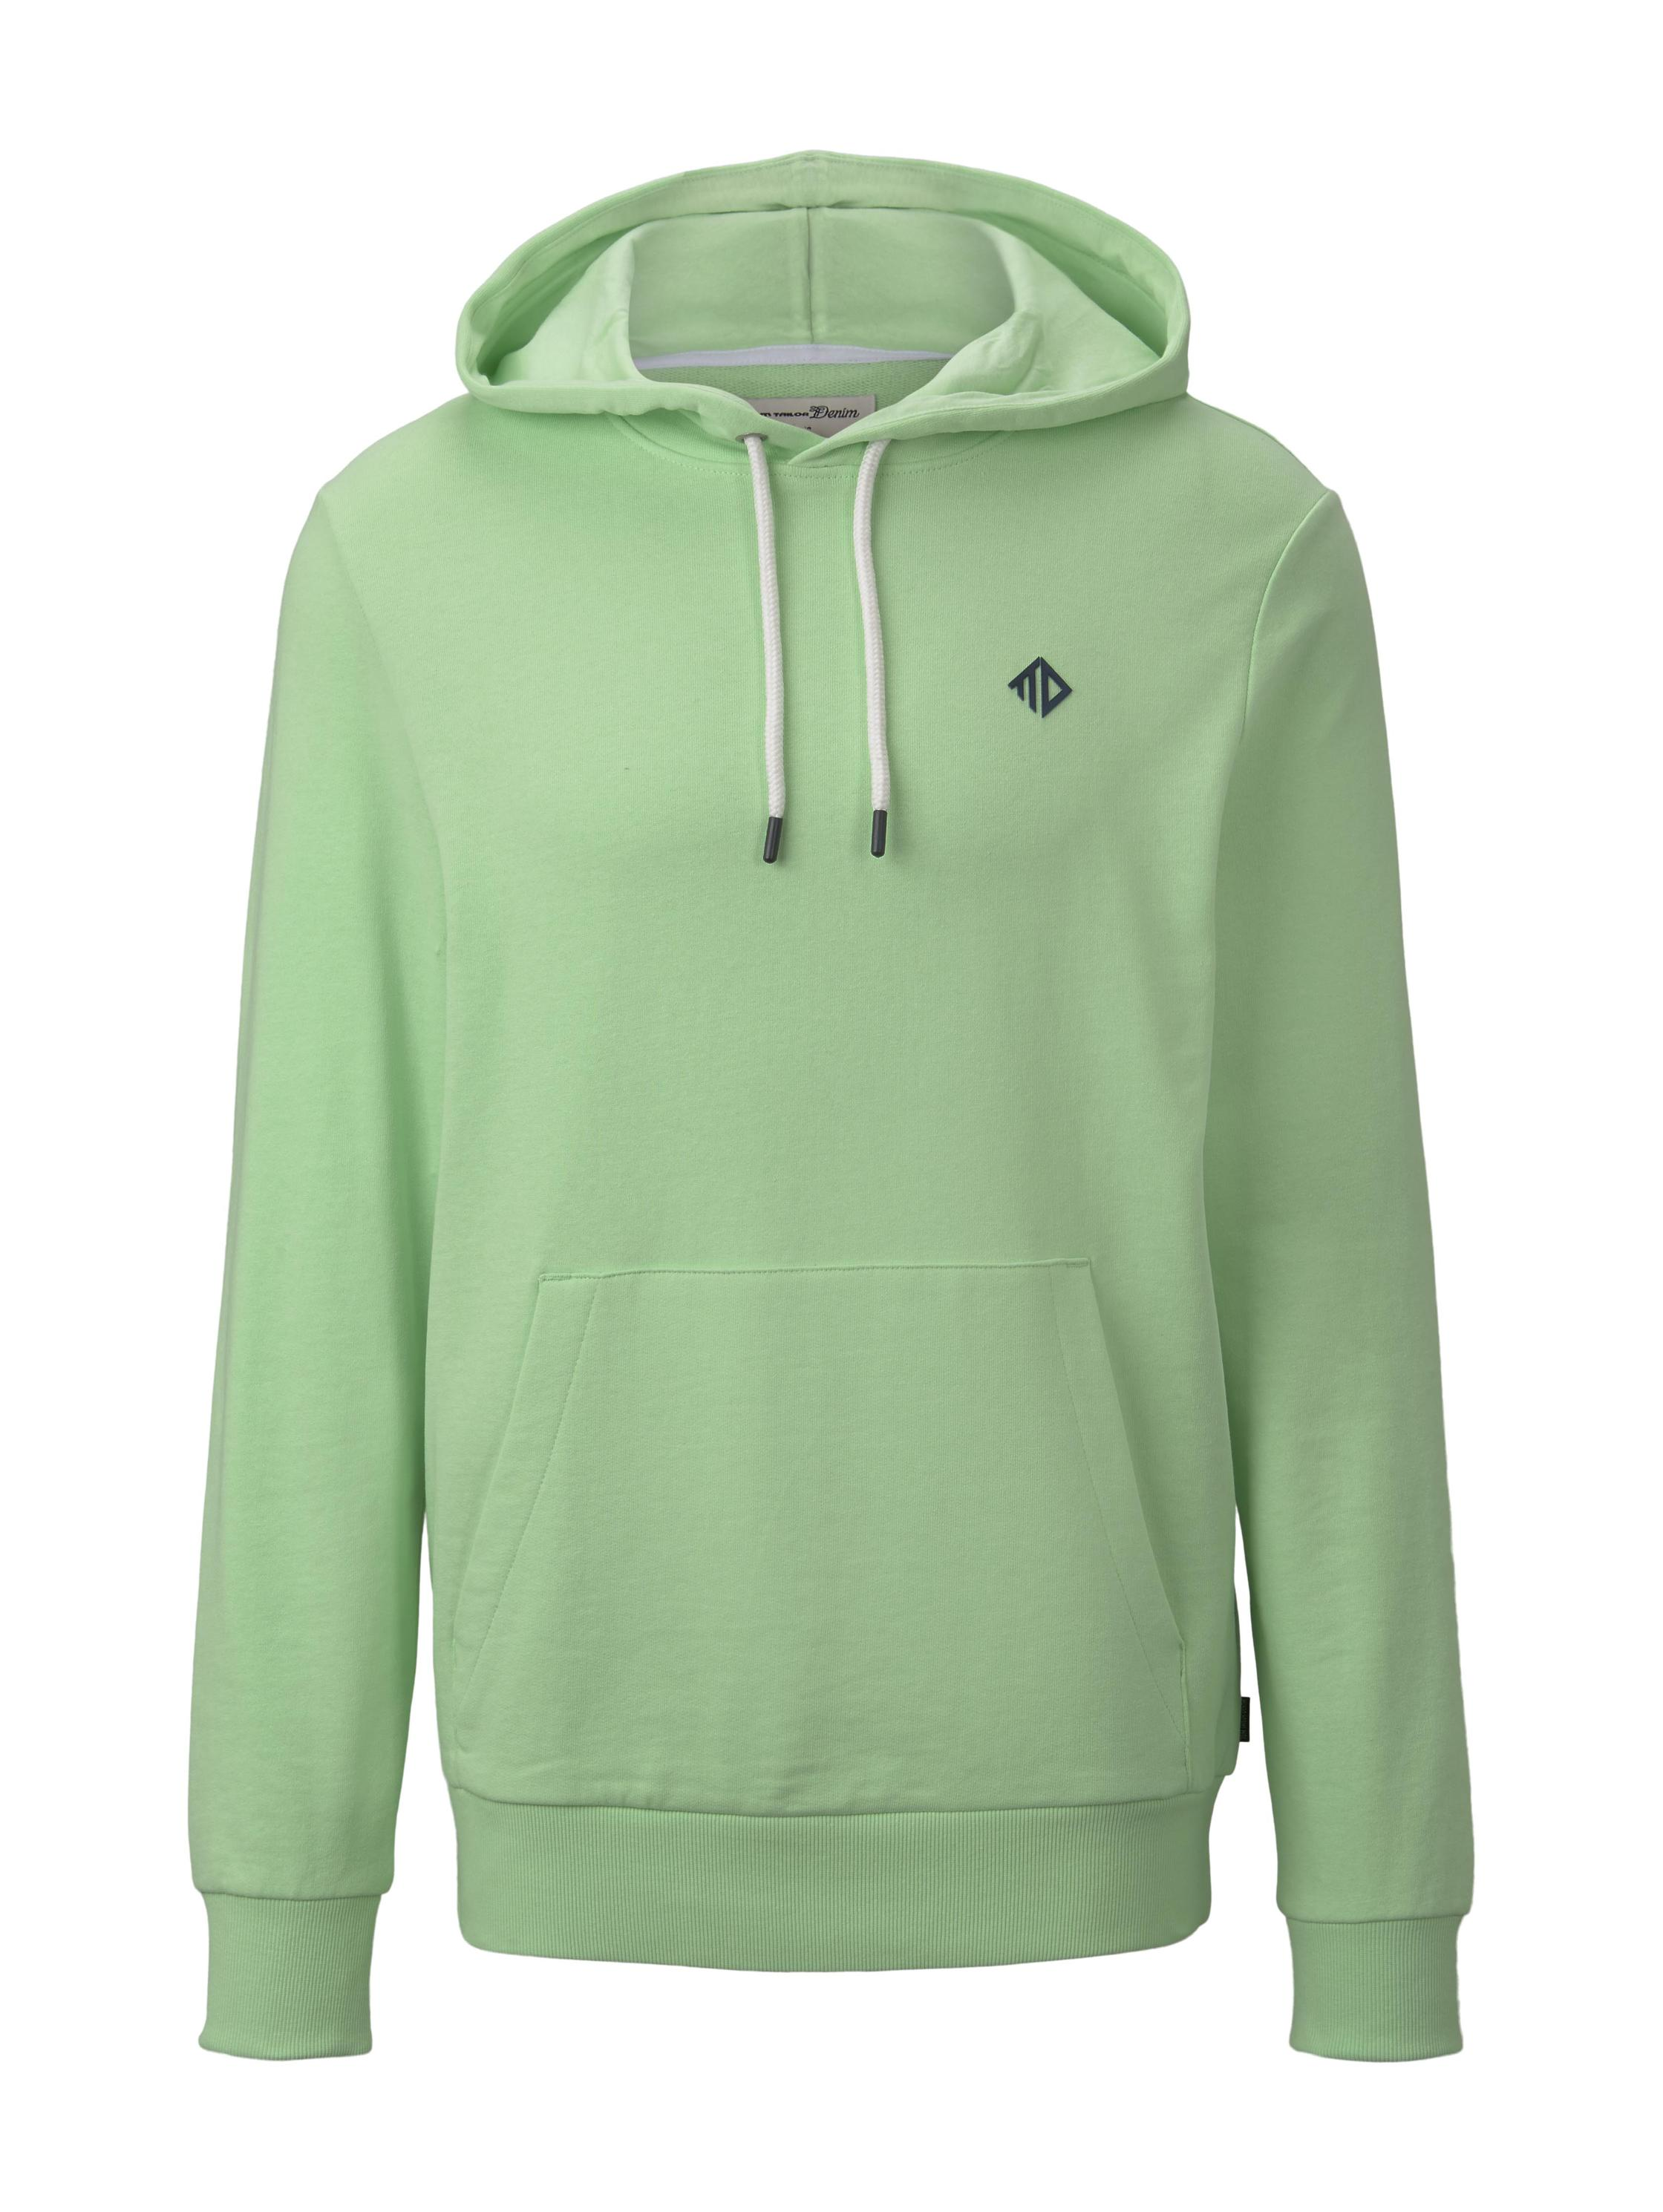 hoodie w. sleeve detail, soft neo green